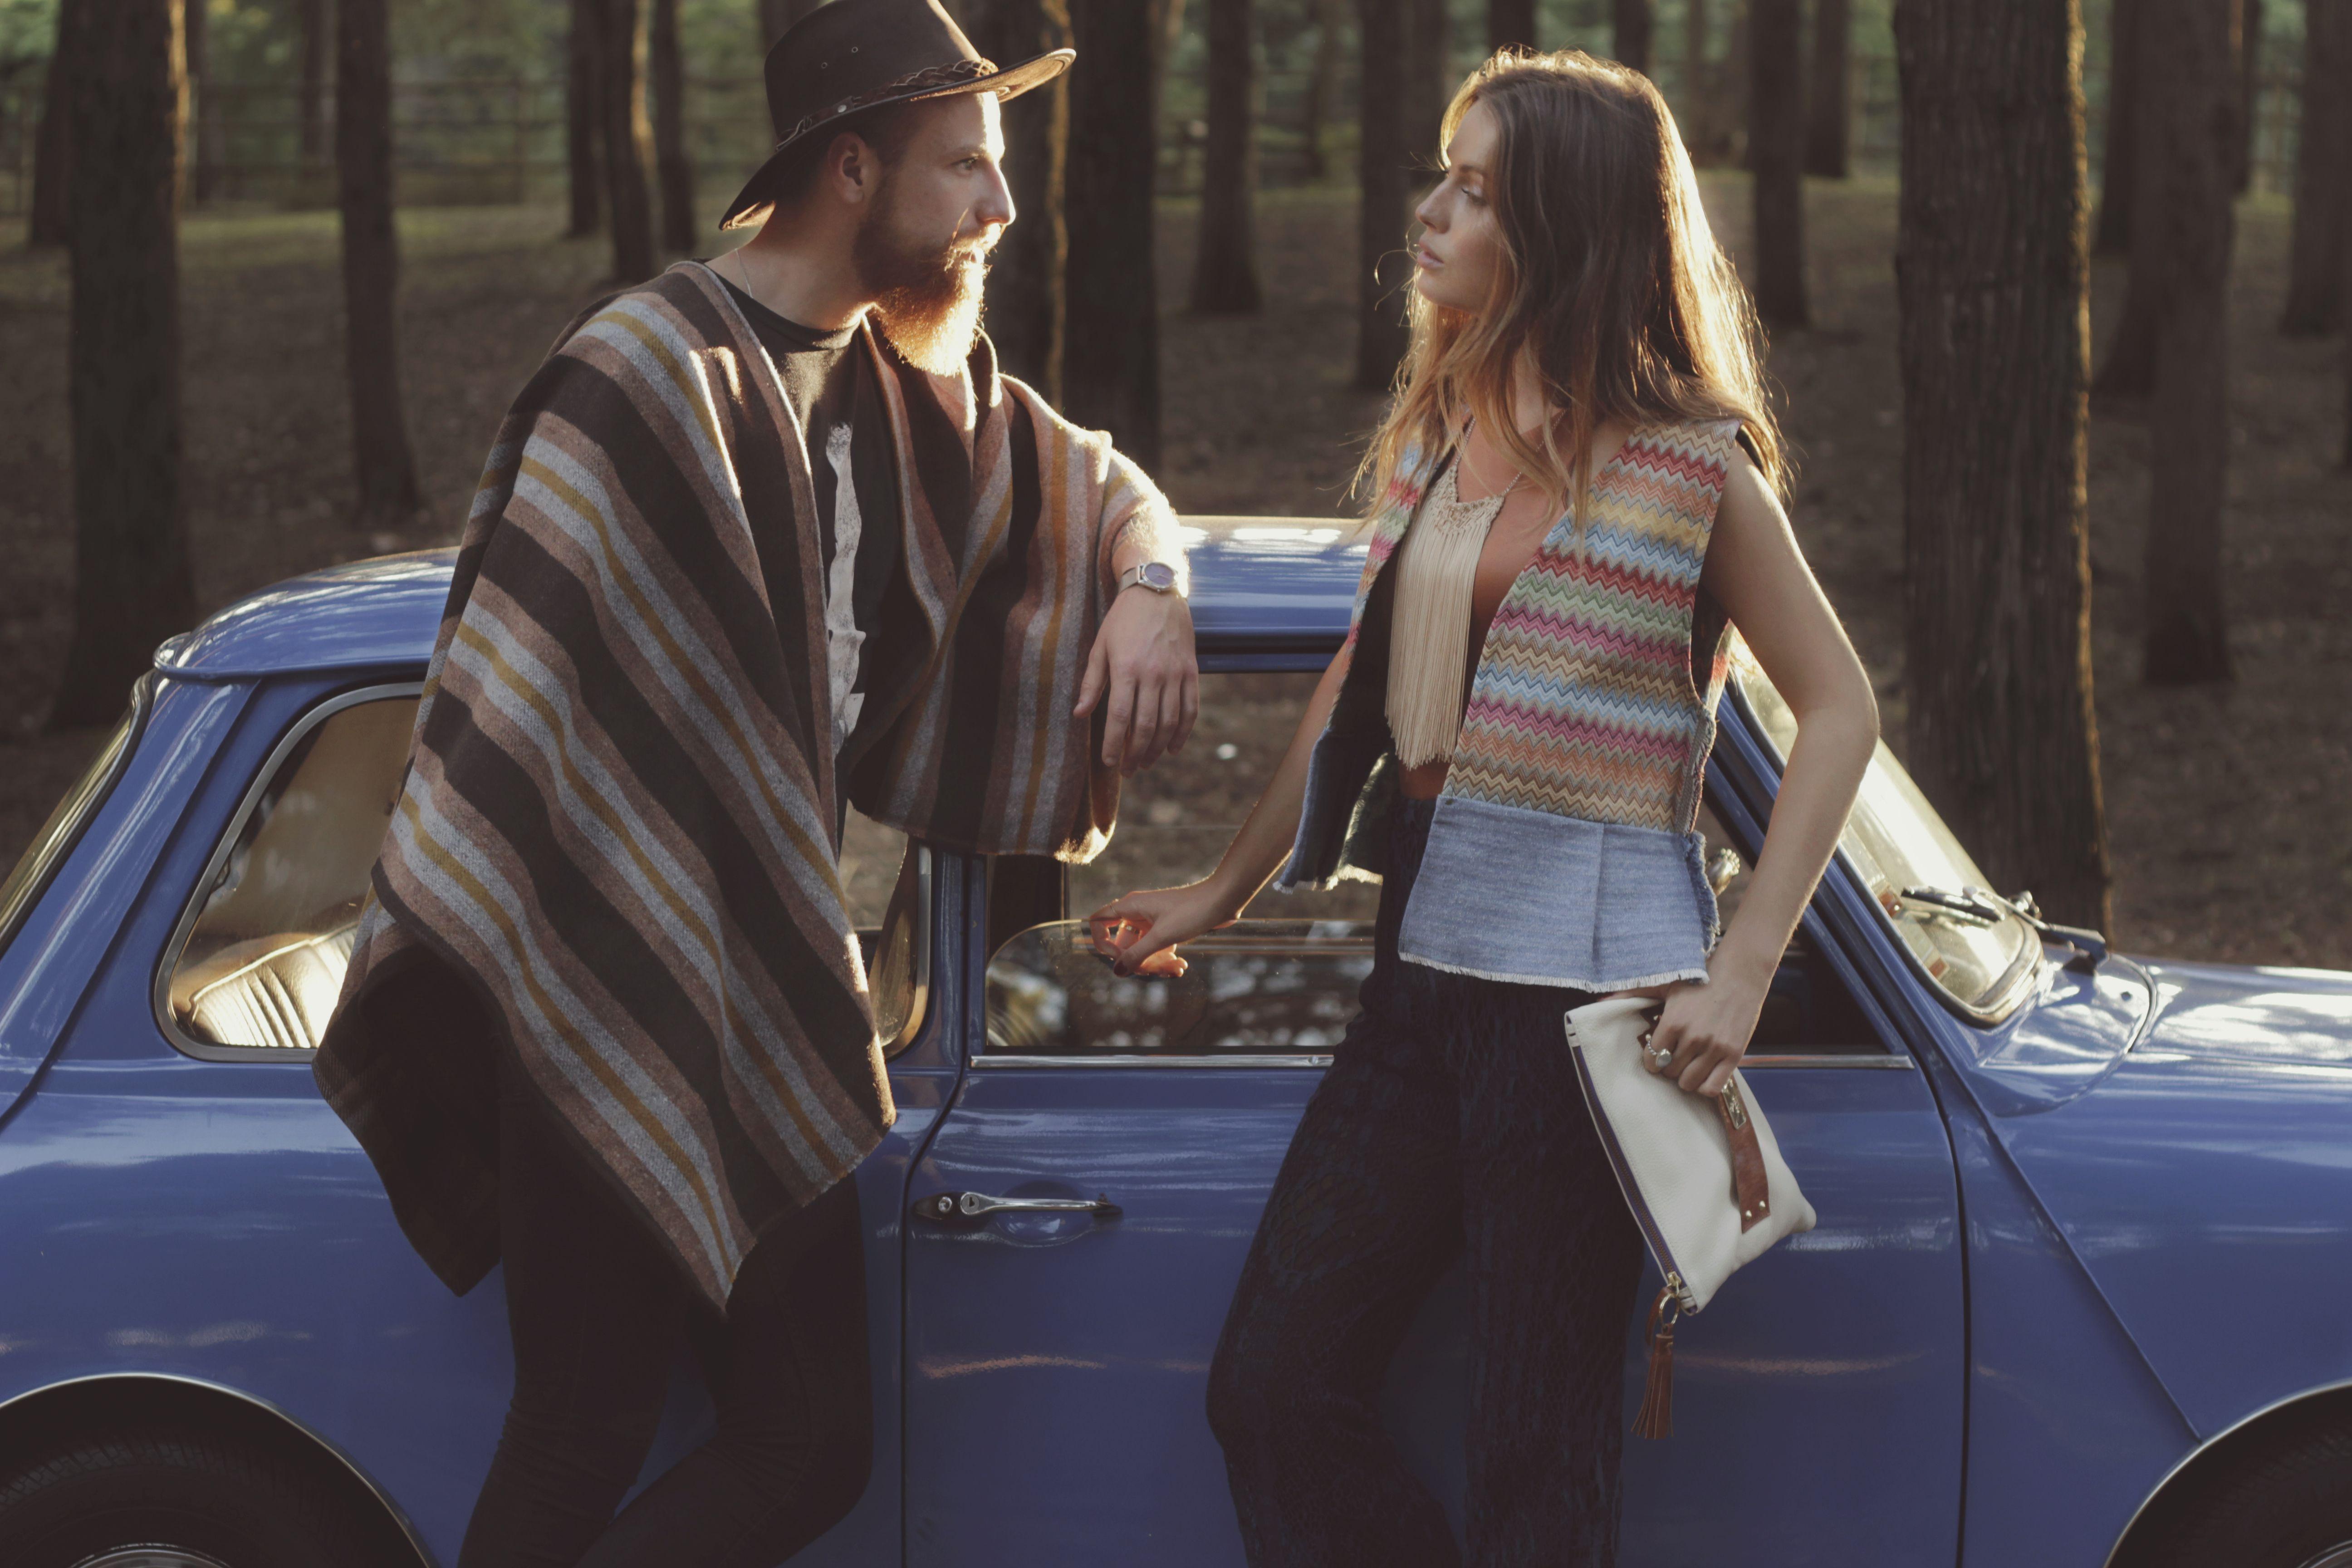 From camille & john online shop. #camilleandjohn #camilleandjohnshoponline #shoponline #fashion #love #couple #woods #freespirit #boho #hippie